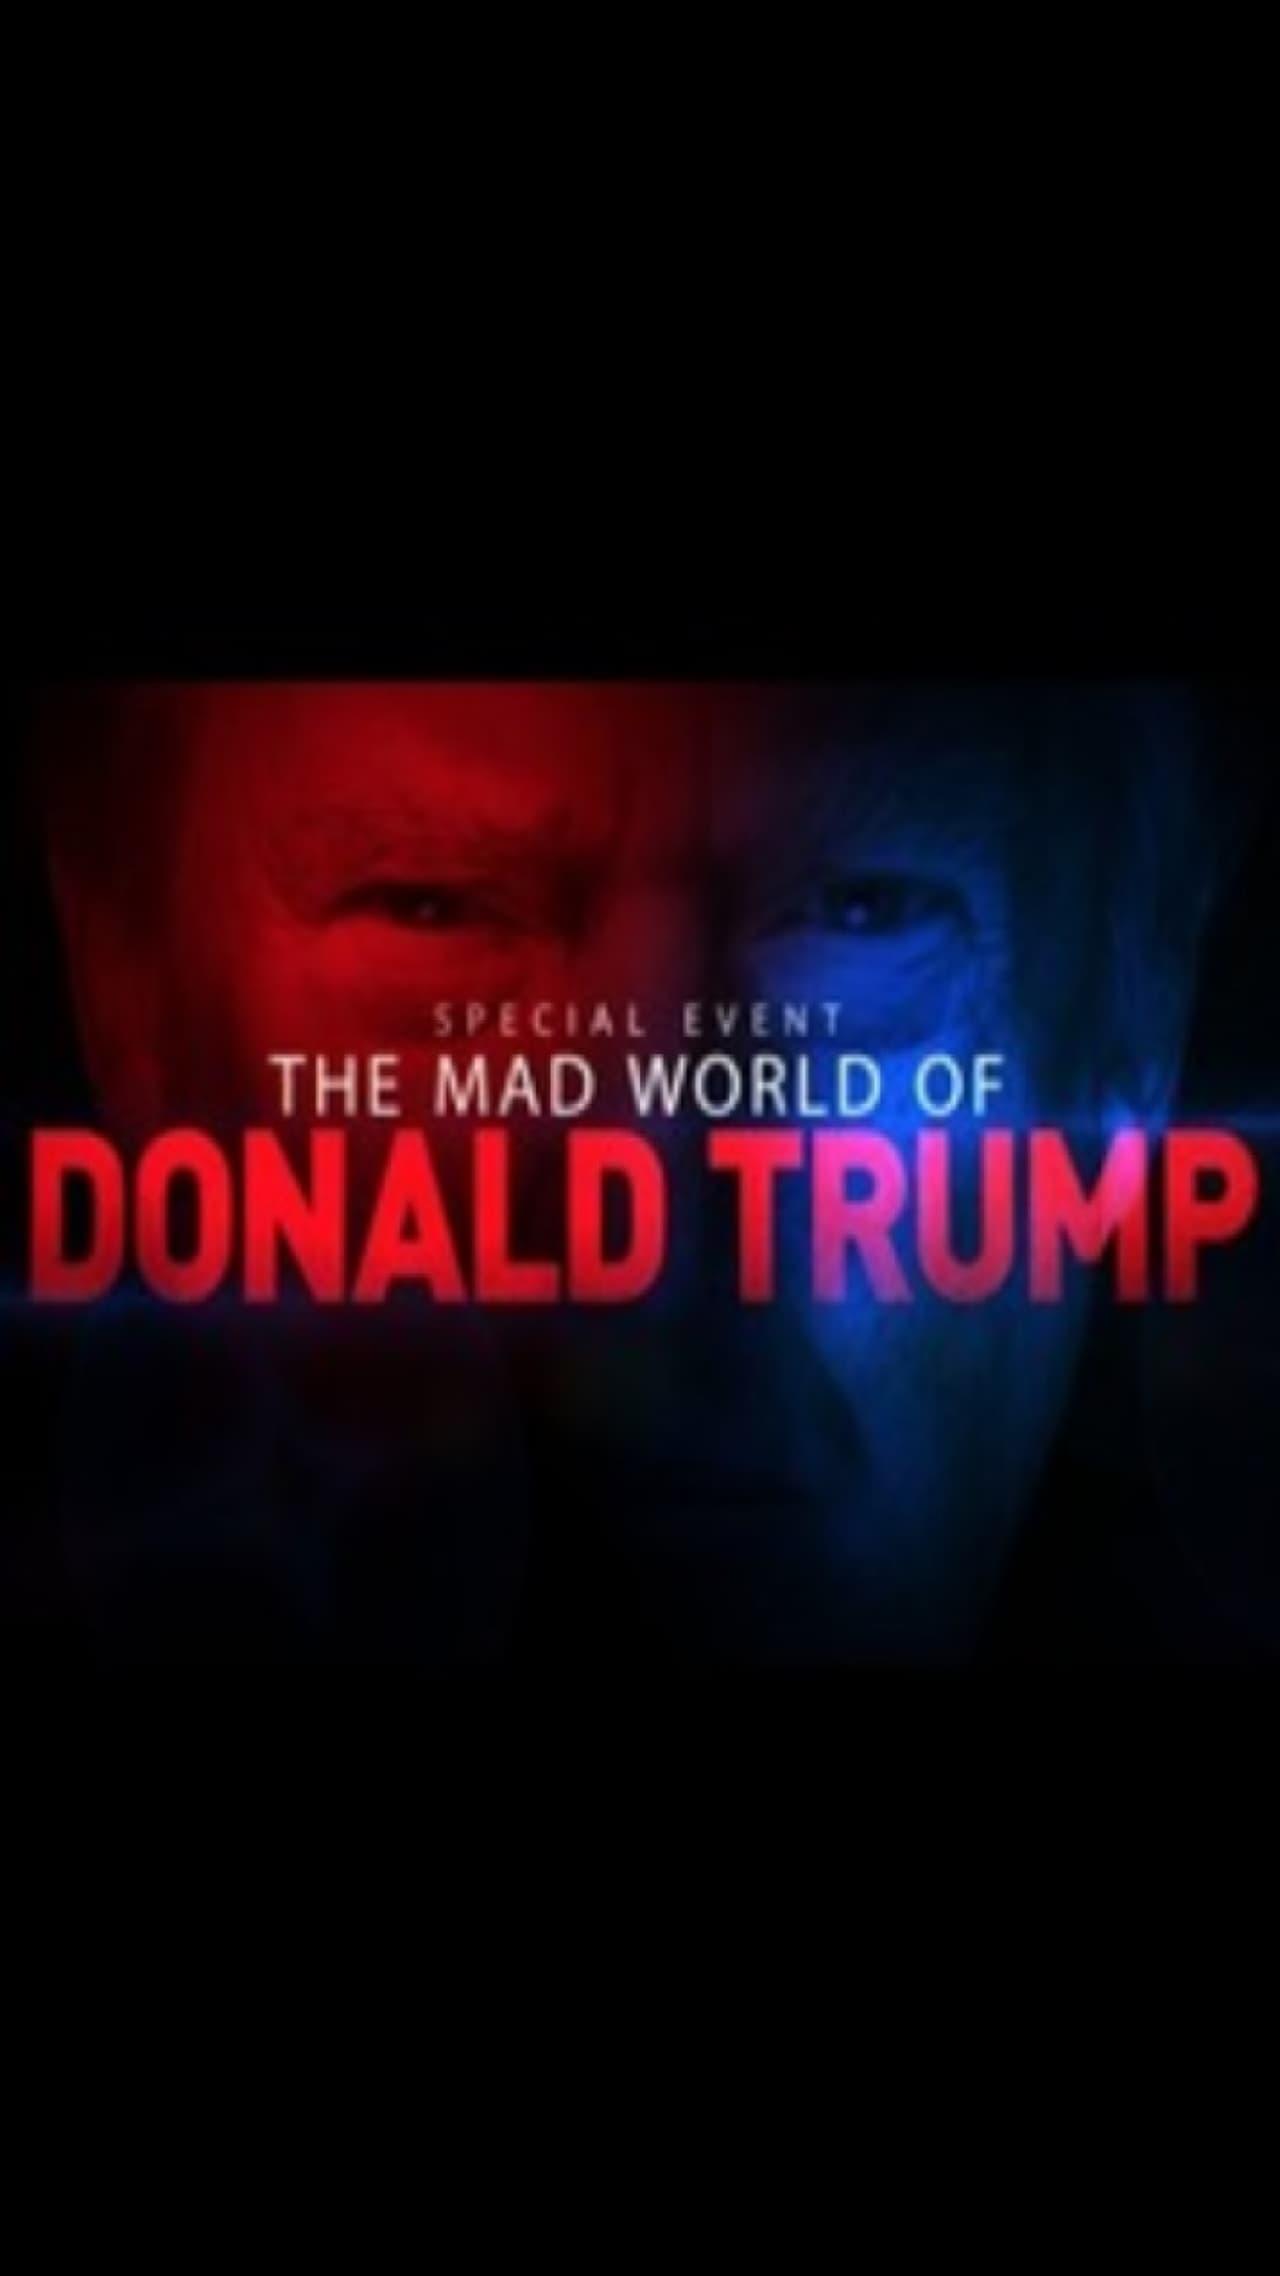 The Mad World of Donald Trump